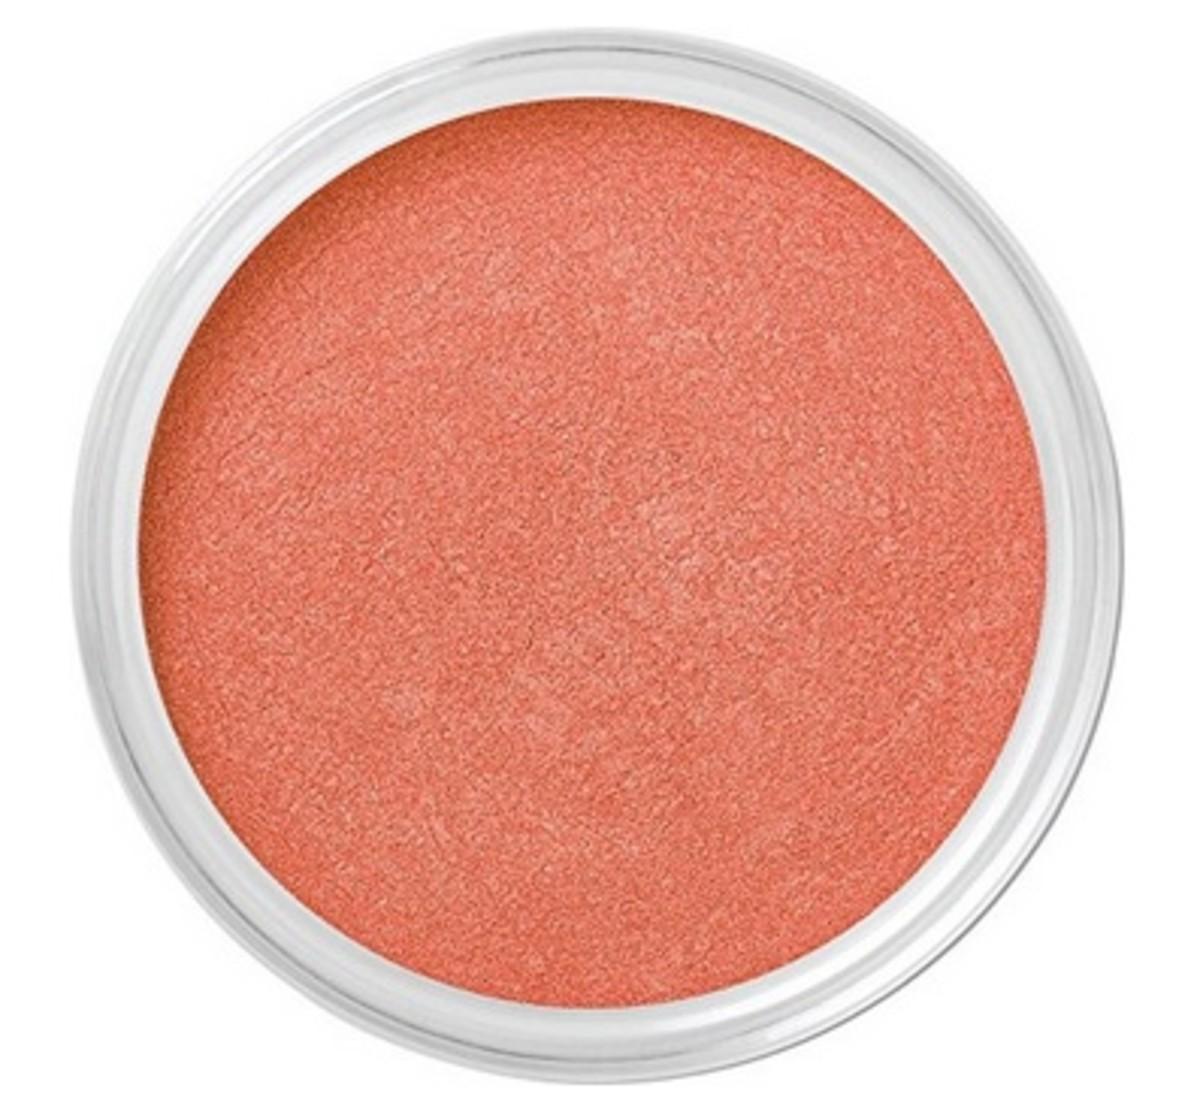 blush-makeup-orange-blush-for-olive-skin